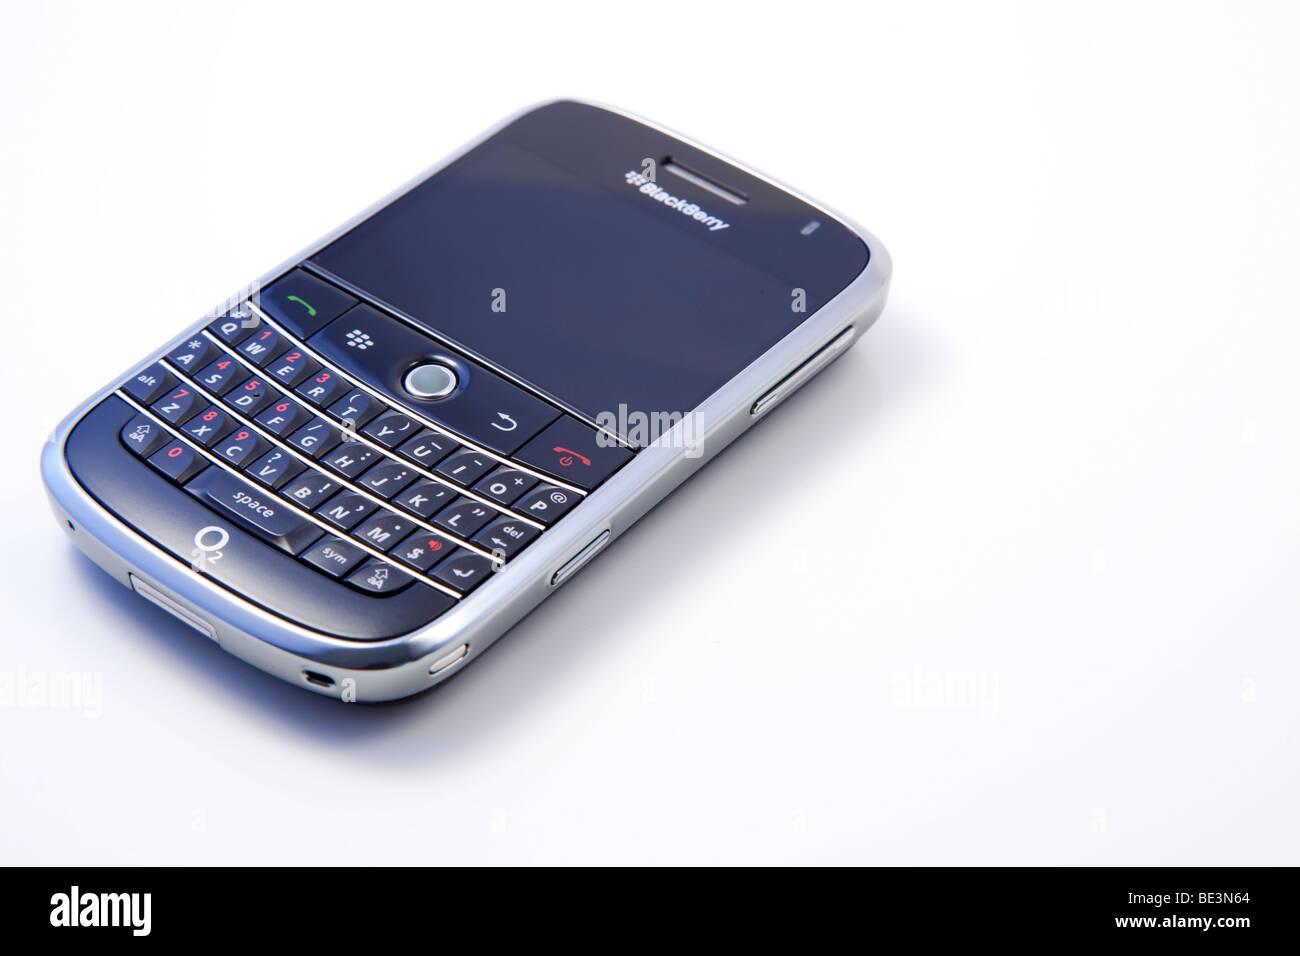 BlackBerry Bold 900 mobile phone device, studio shot - Stock Image